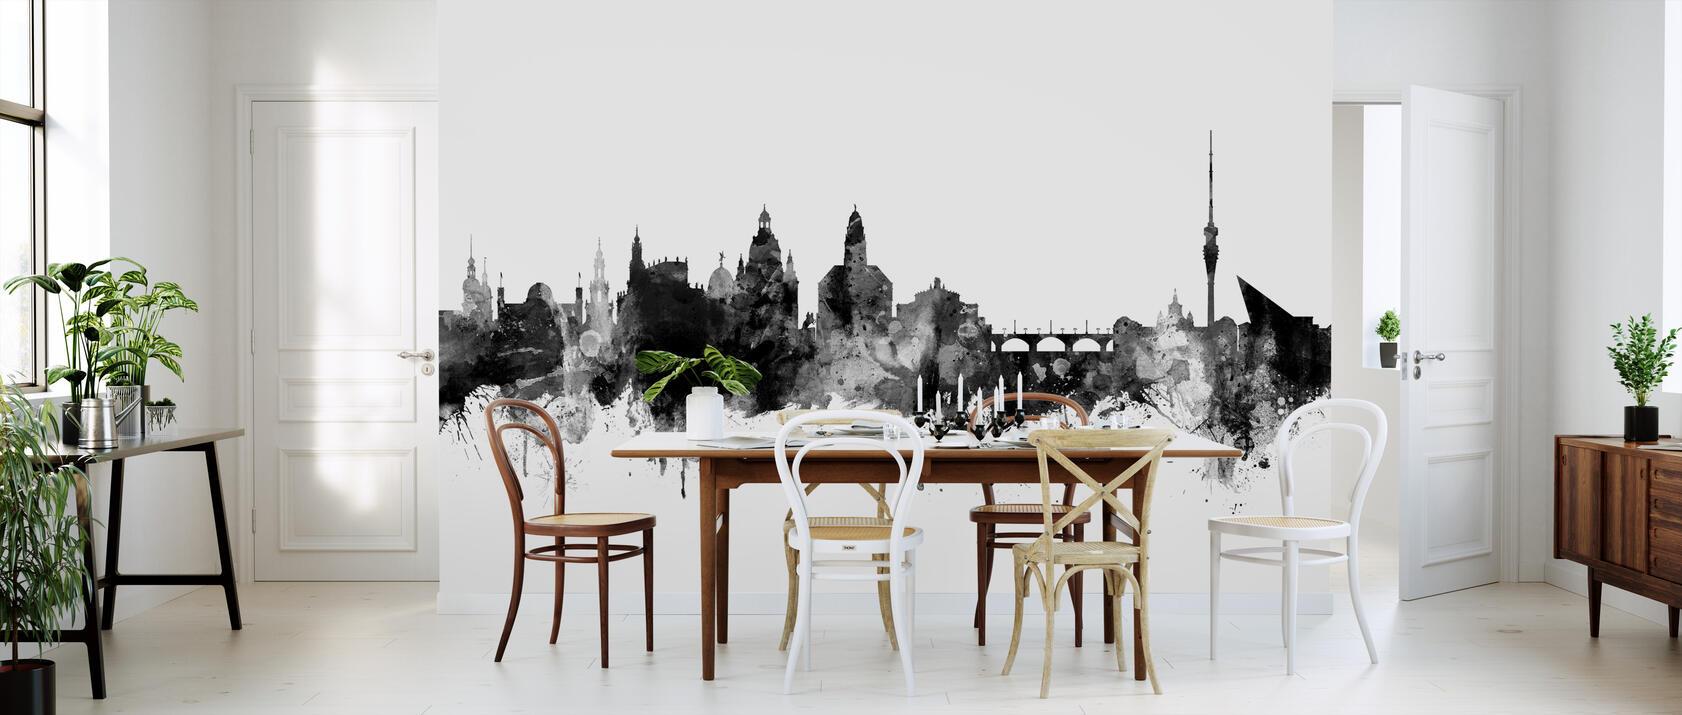 dresden skyline black fototapete nach ma photowall. Black Bedroom Furniture Sets. Home Design Ideas